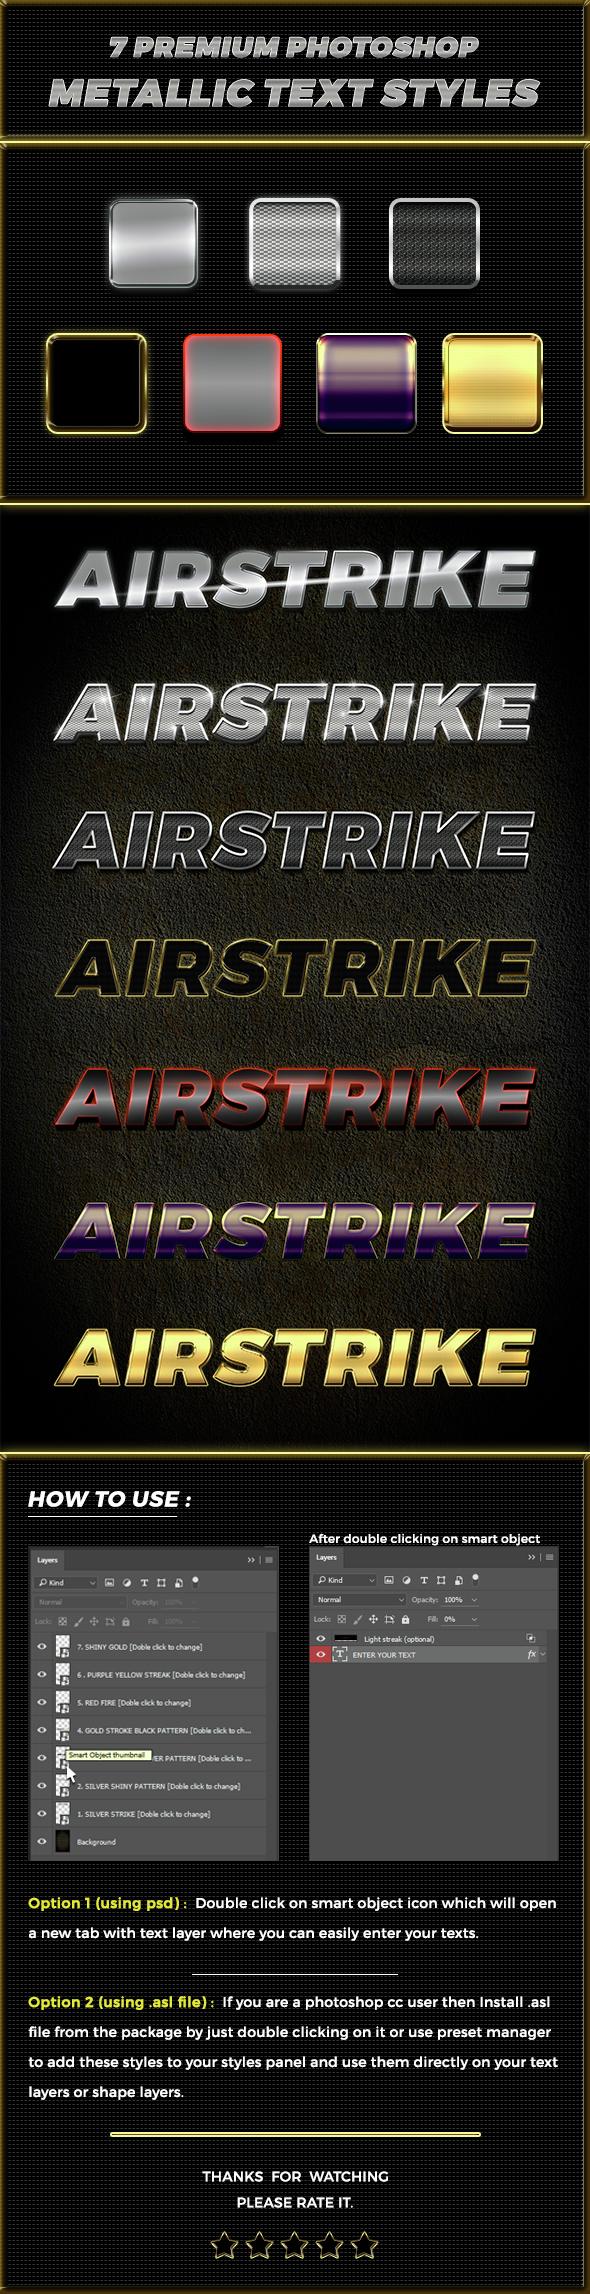 7 Premium Airstrike Photoshop metallic text styles - Text Effects Styles